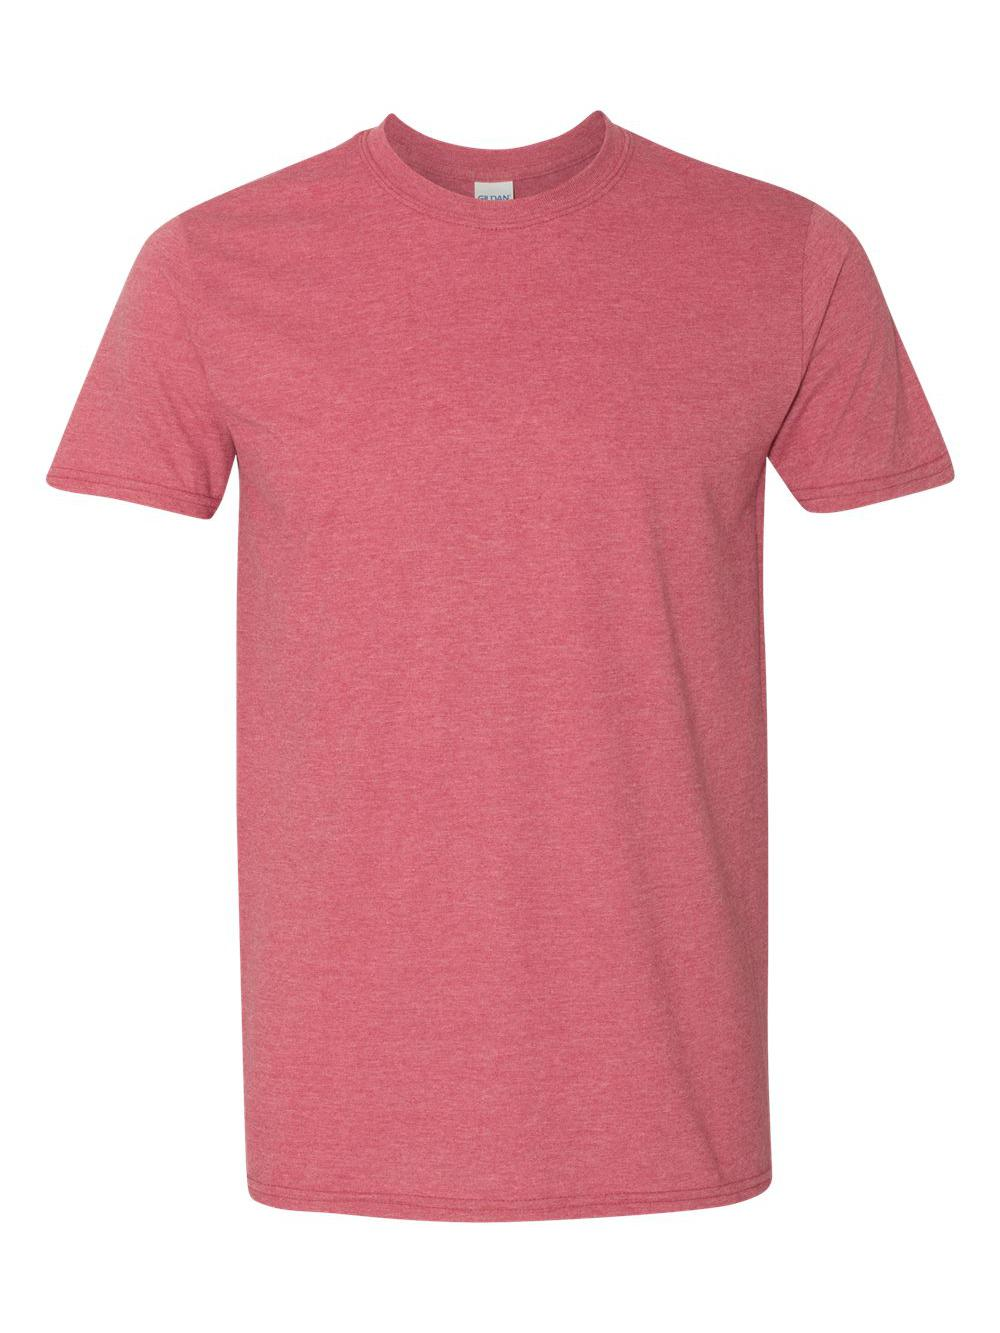 Gildan-Softstyle-T-Shirt-64000 thumbnail 57